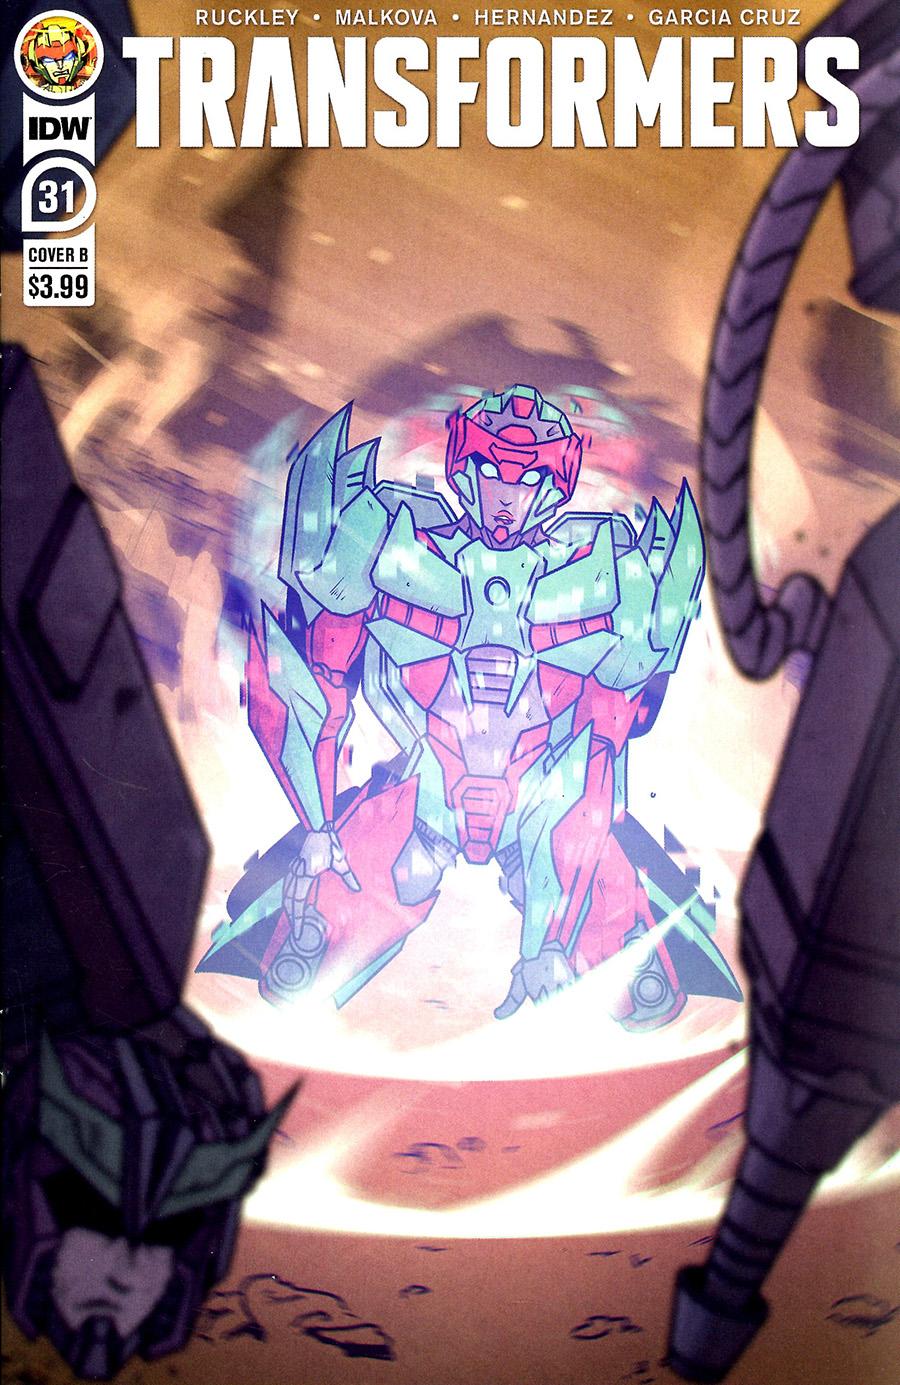 Transformers Vol 4 #31 Cover B Variant Chris Panda Cover